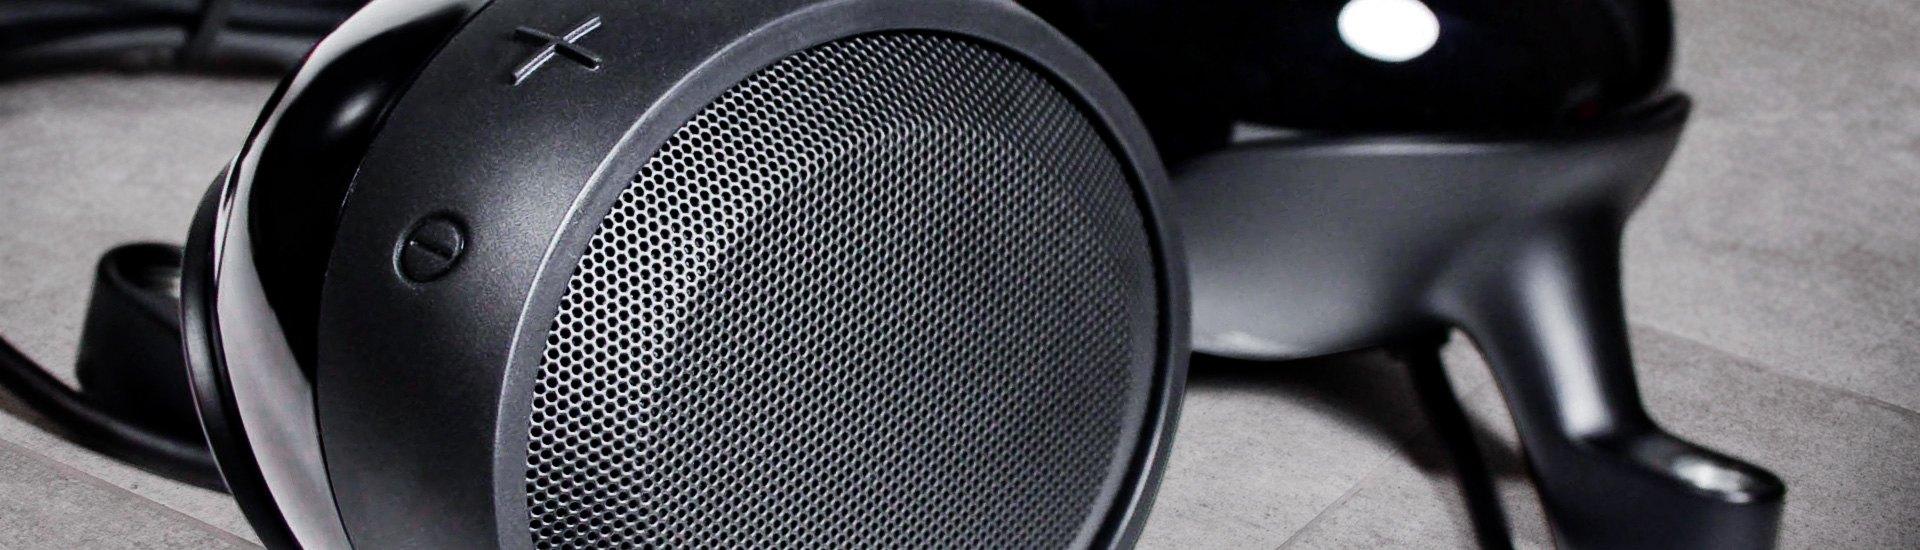 BOSS AUDIO 800W 2-SPEAKER BLUETOOTH SOUND SYSTEM CHROME ALL HONDA MOTORCYCLES